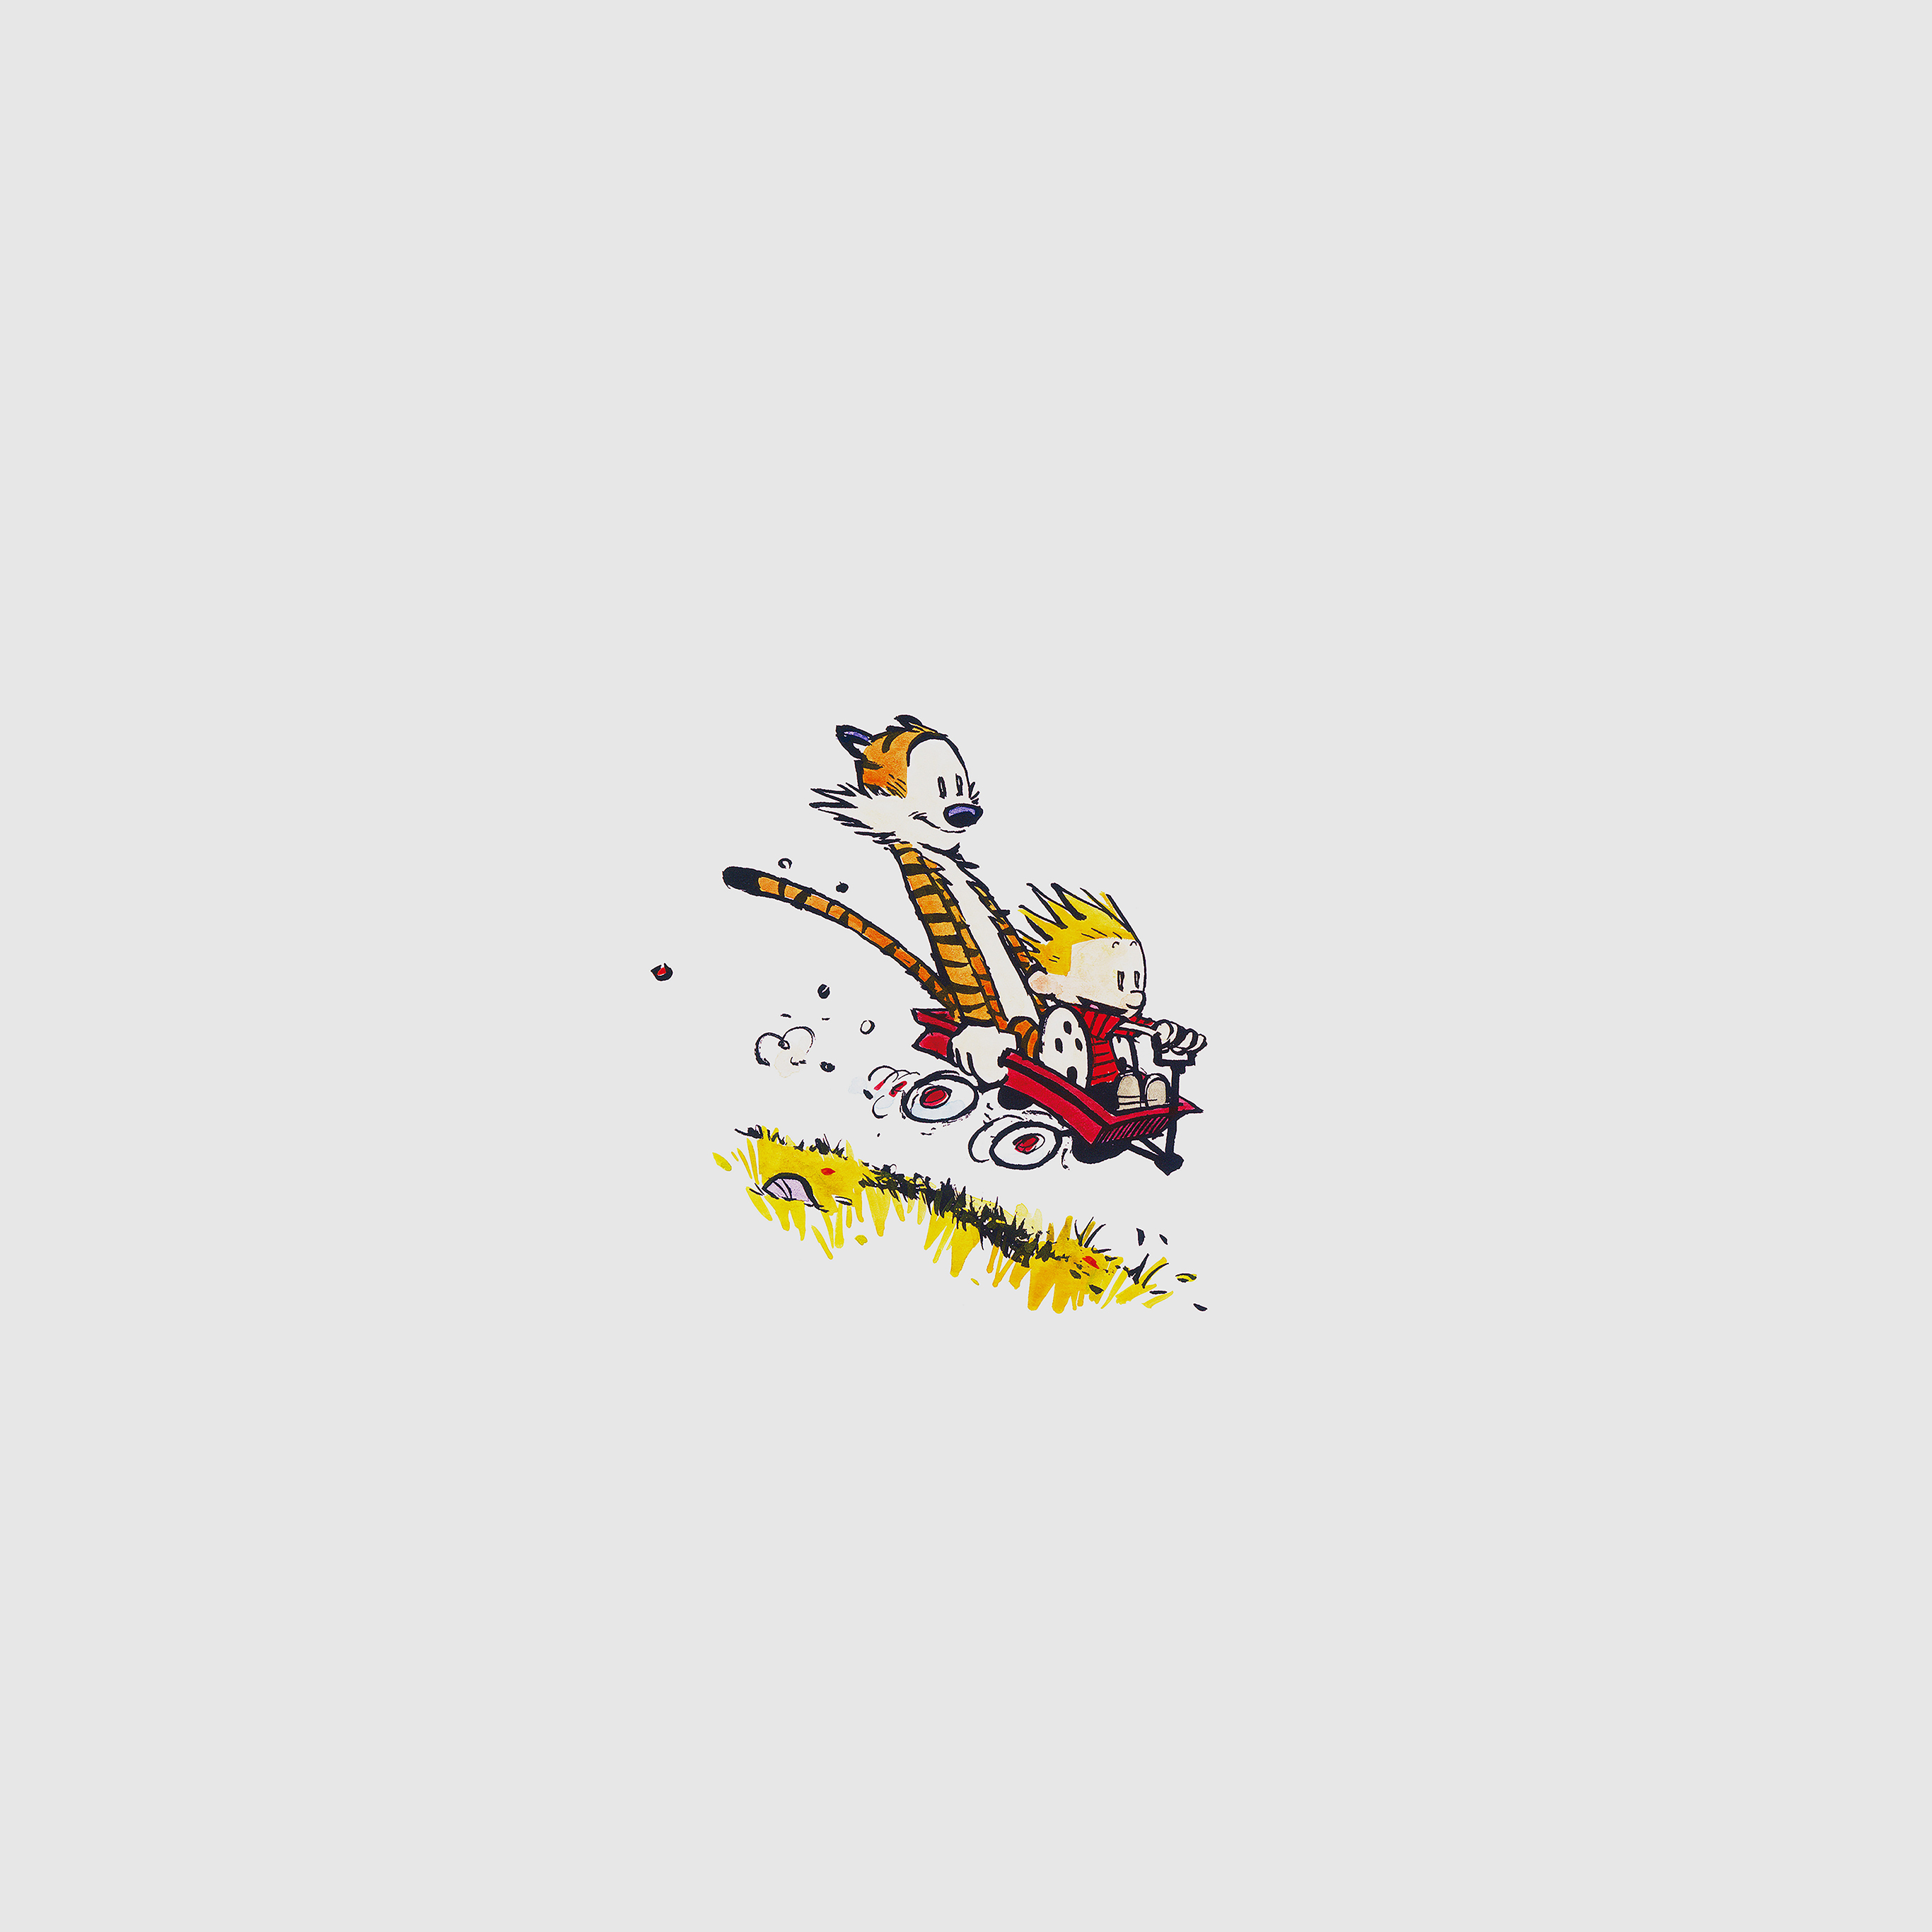 Af62 Calvin Hobbes Happy Times Cartoon Wallpaper